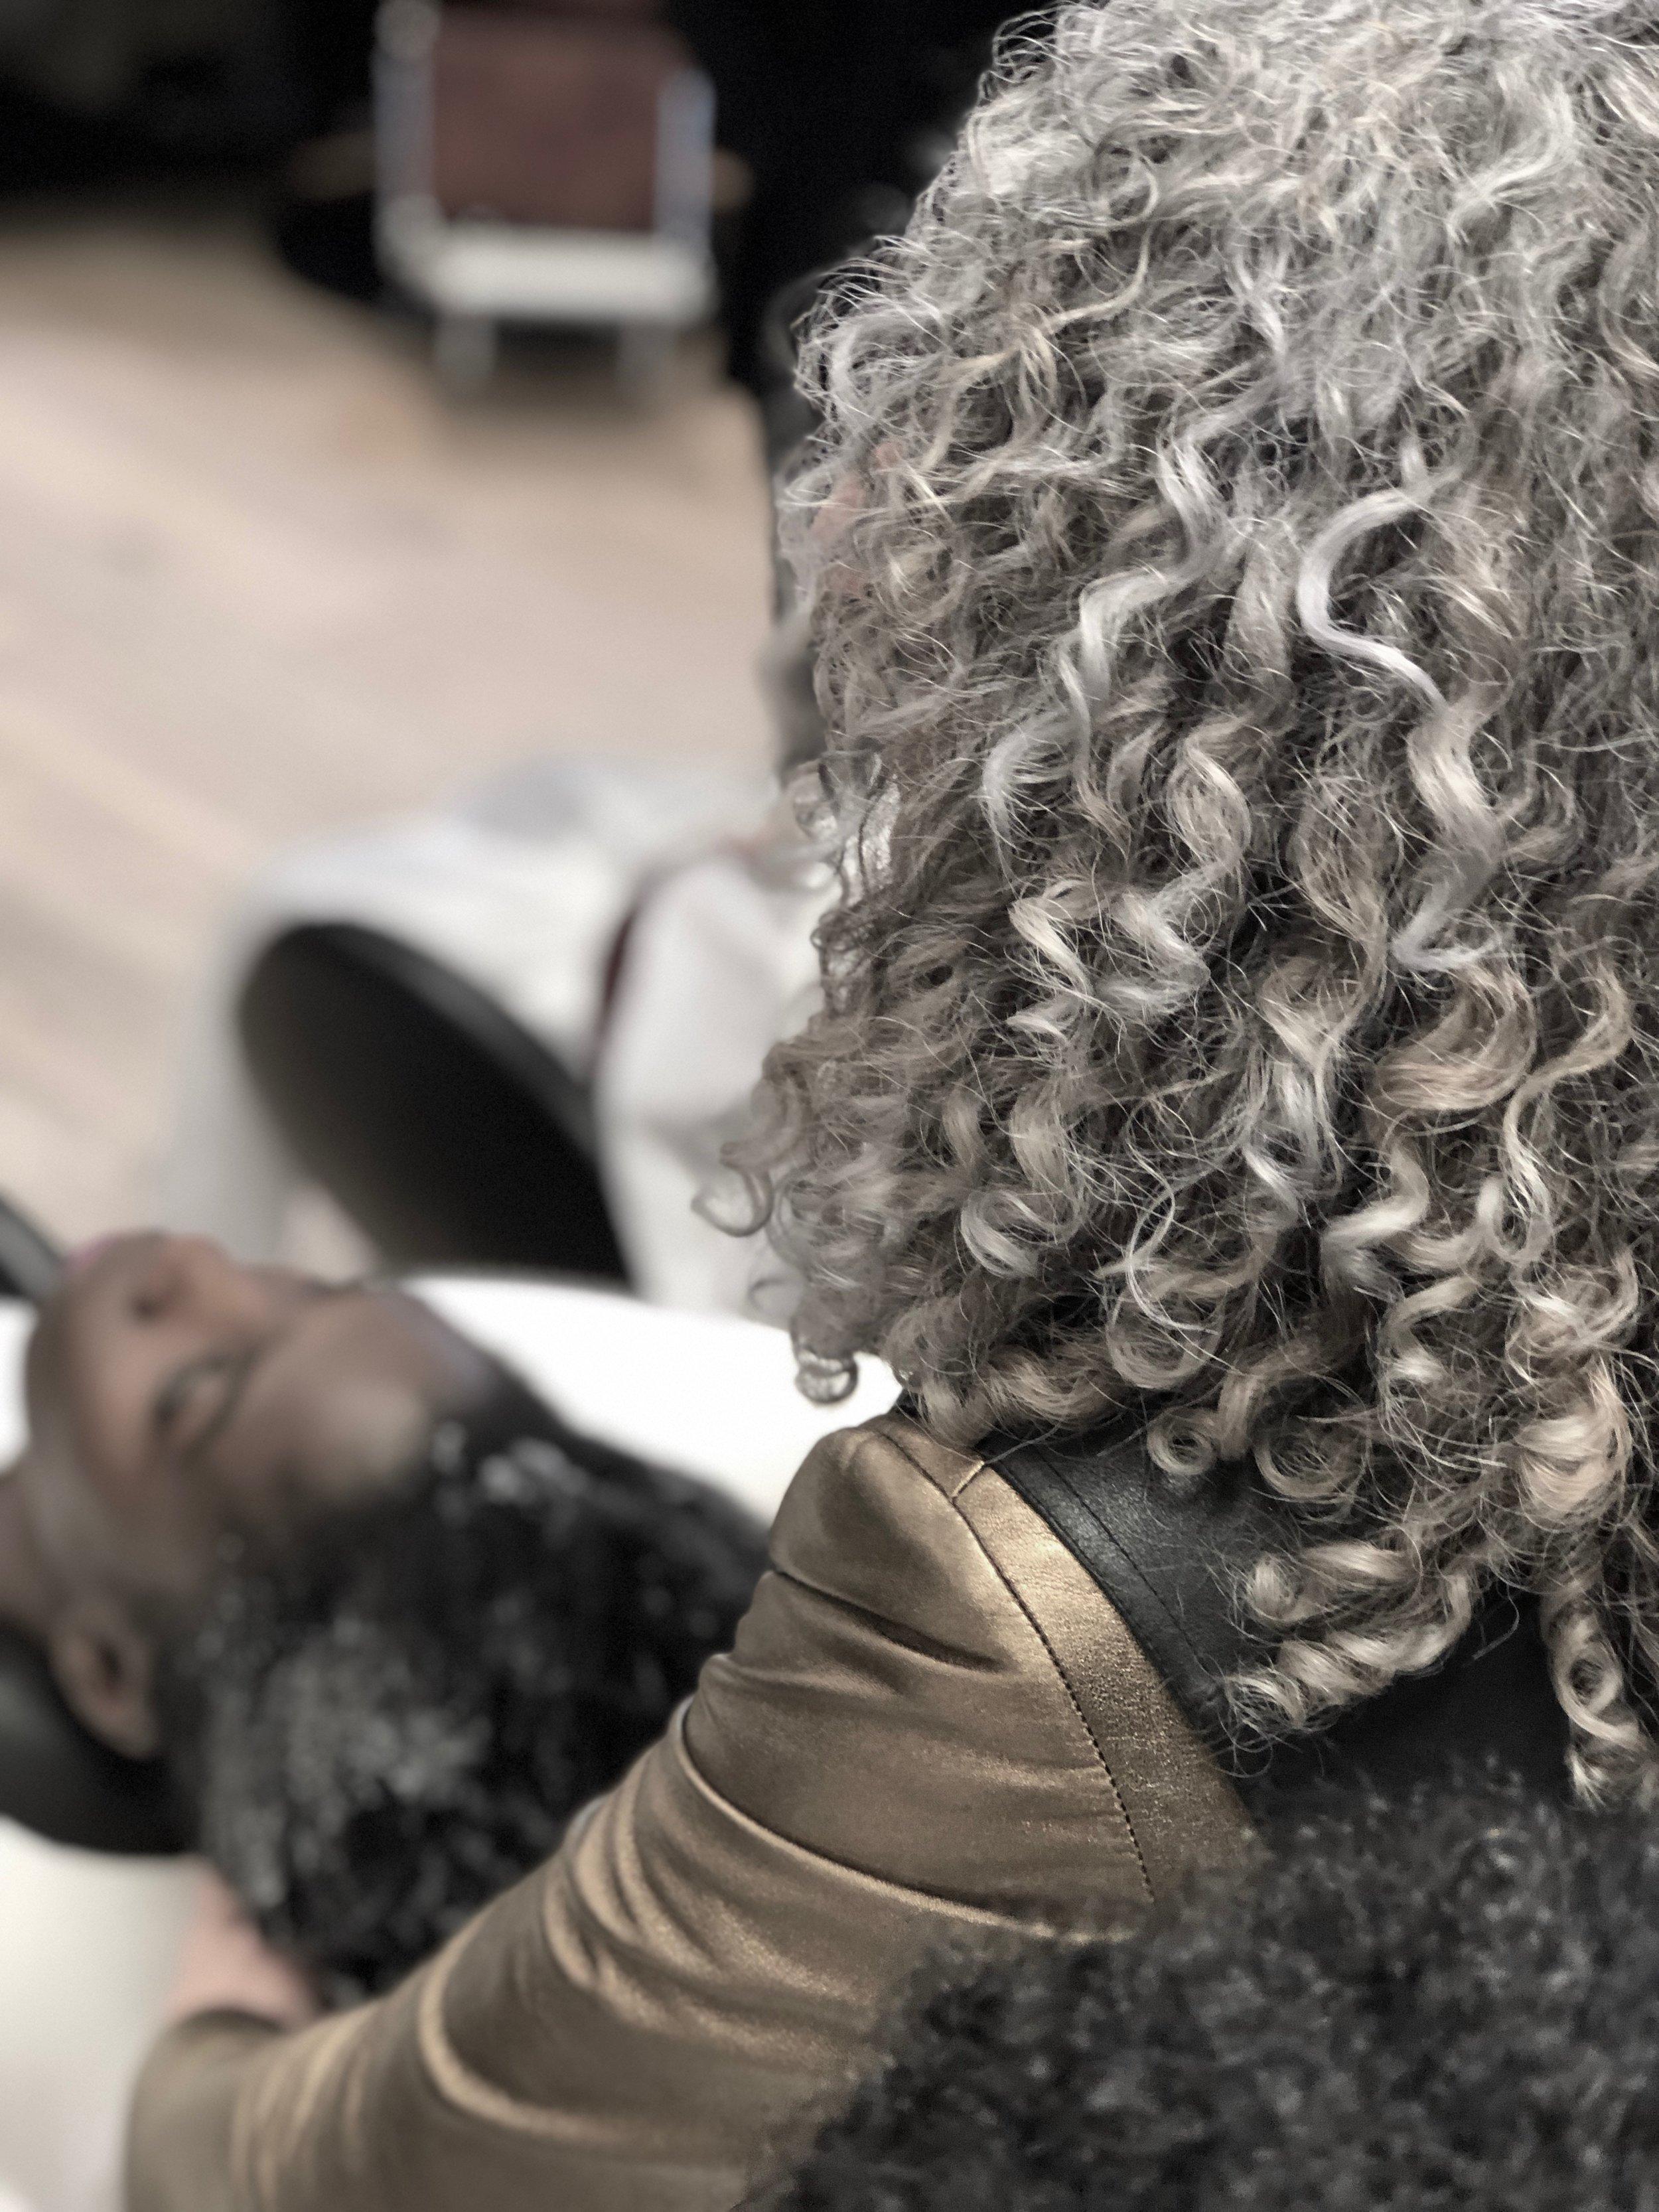 Original Curly Girl Lorraine Massey, Mid-flow- cleansing fractal curls